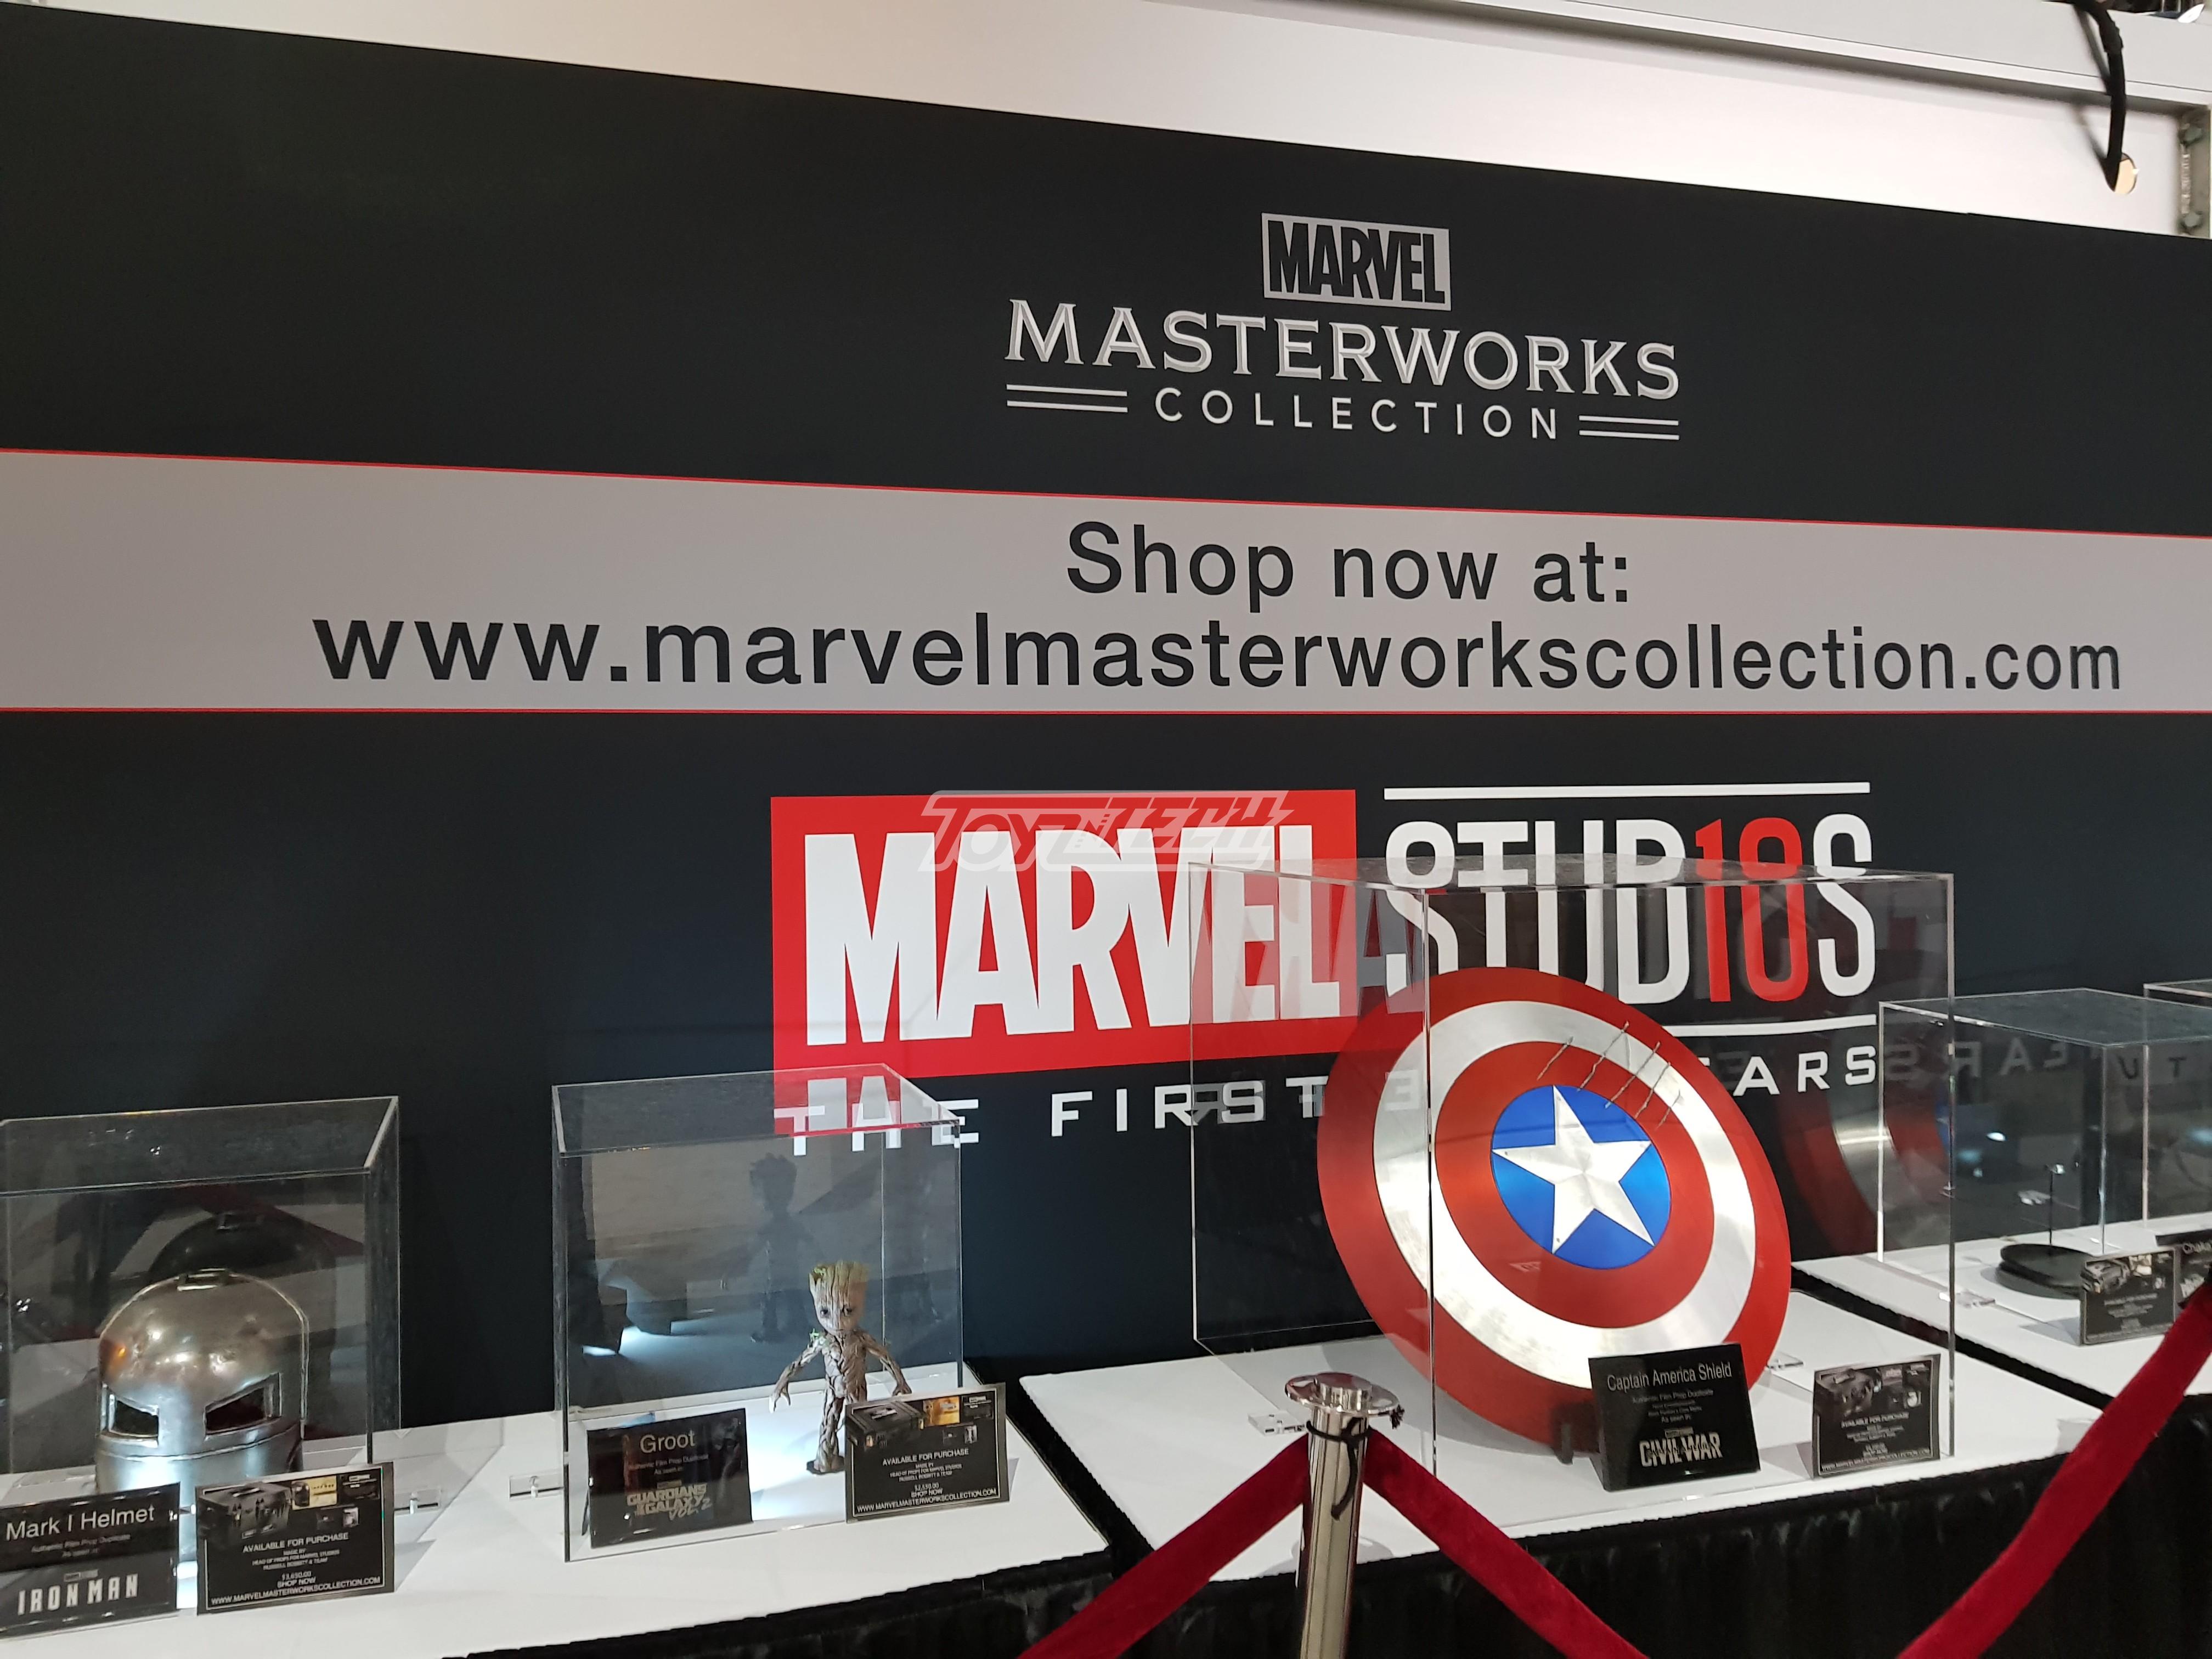 Marvel Masterworks Collection